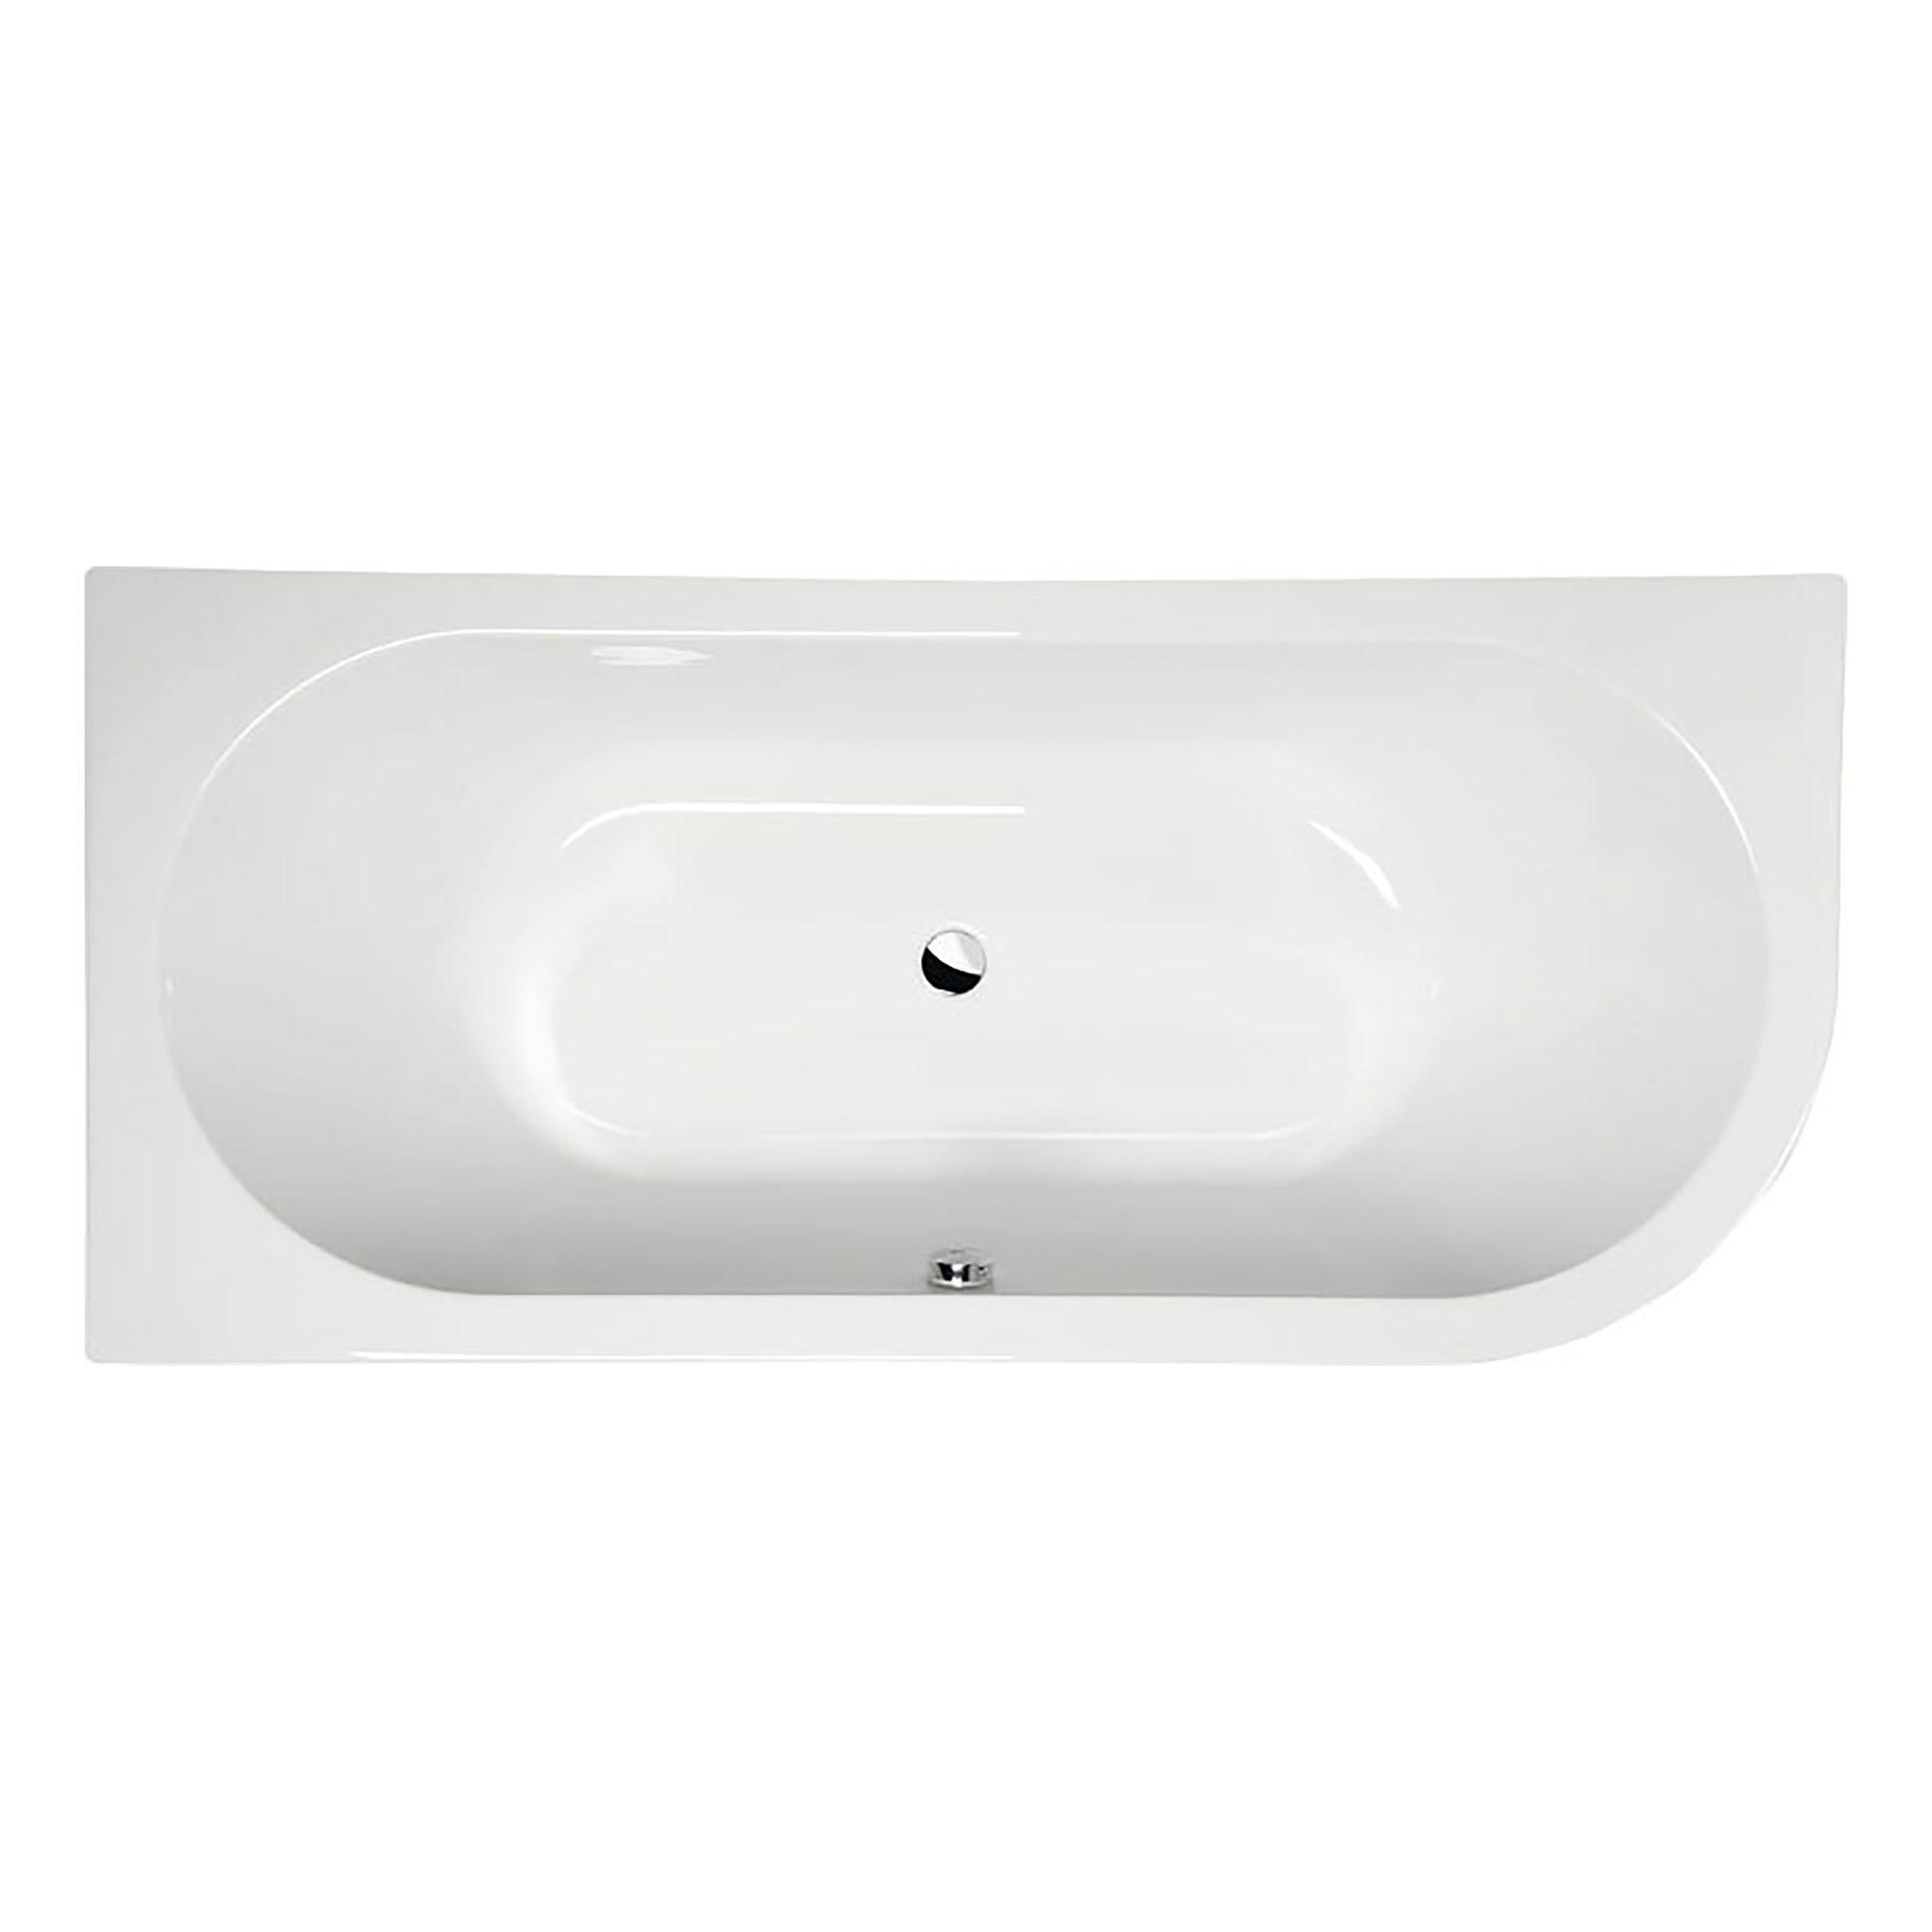 Акриловая ванна Alpen Viva 185x80 L акриловая ванна alpen astra 165x80 l